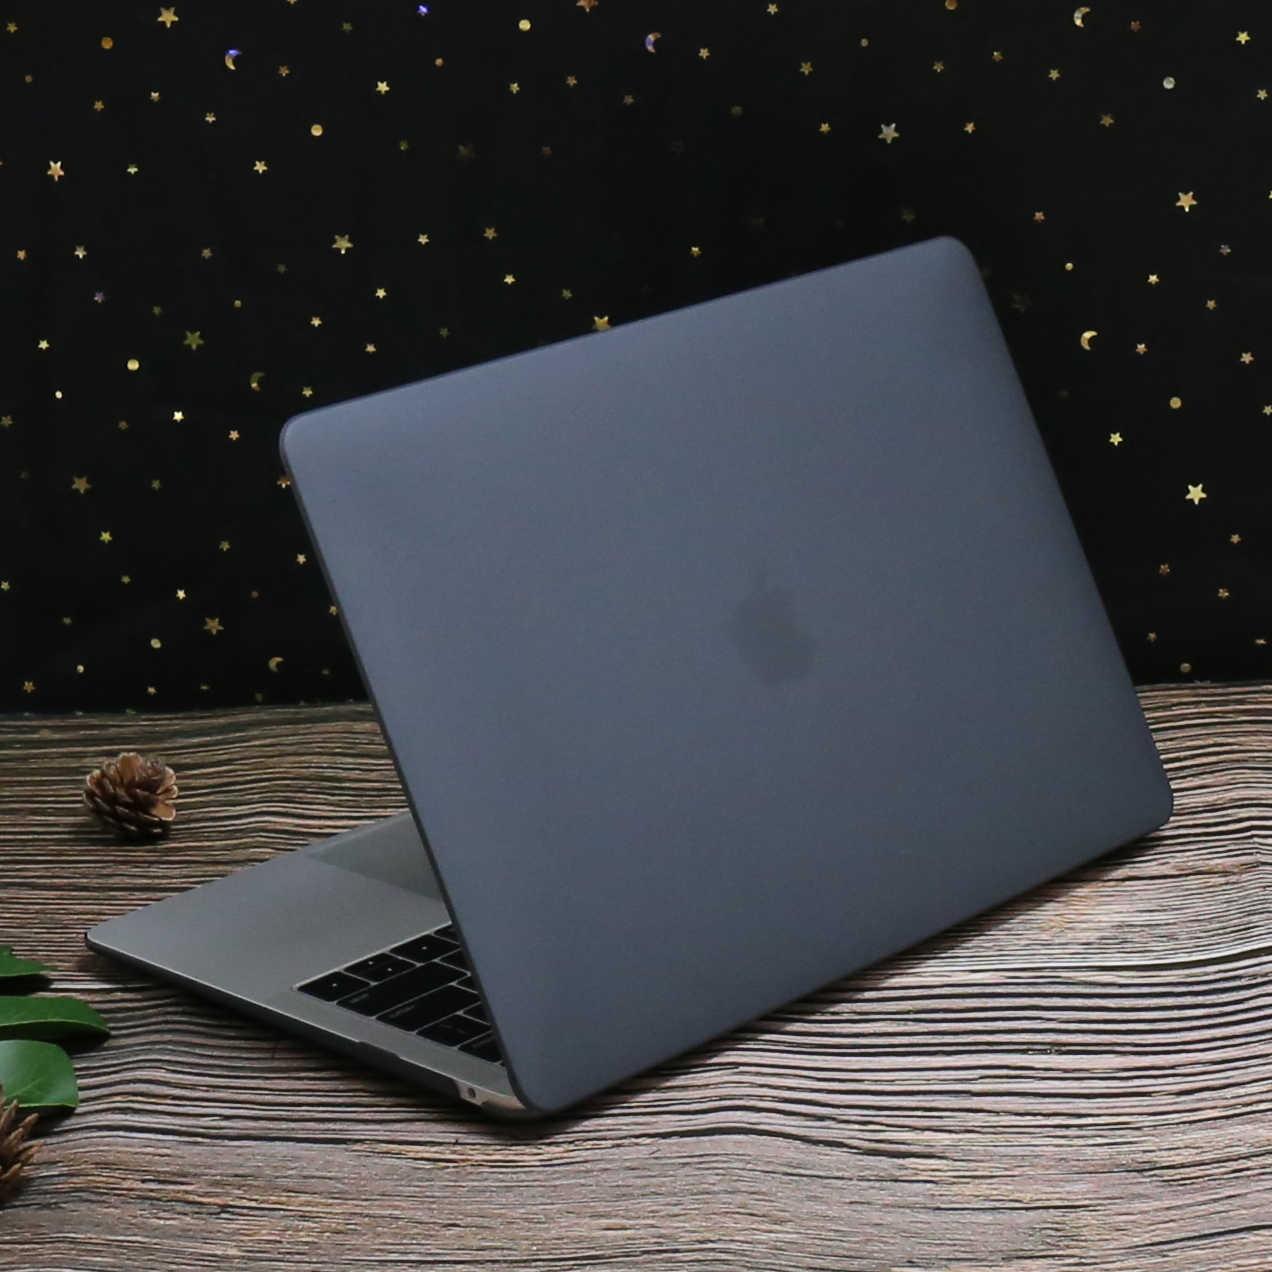 Crystal Matte etui na laptopa dla MacBook Air 13 Pro 16 11 Pro 15 12 cal przypadku Touch Bar matowe pokrycie A1706 A2141 A1932 A2159 A2179